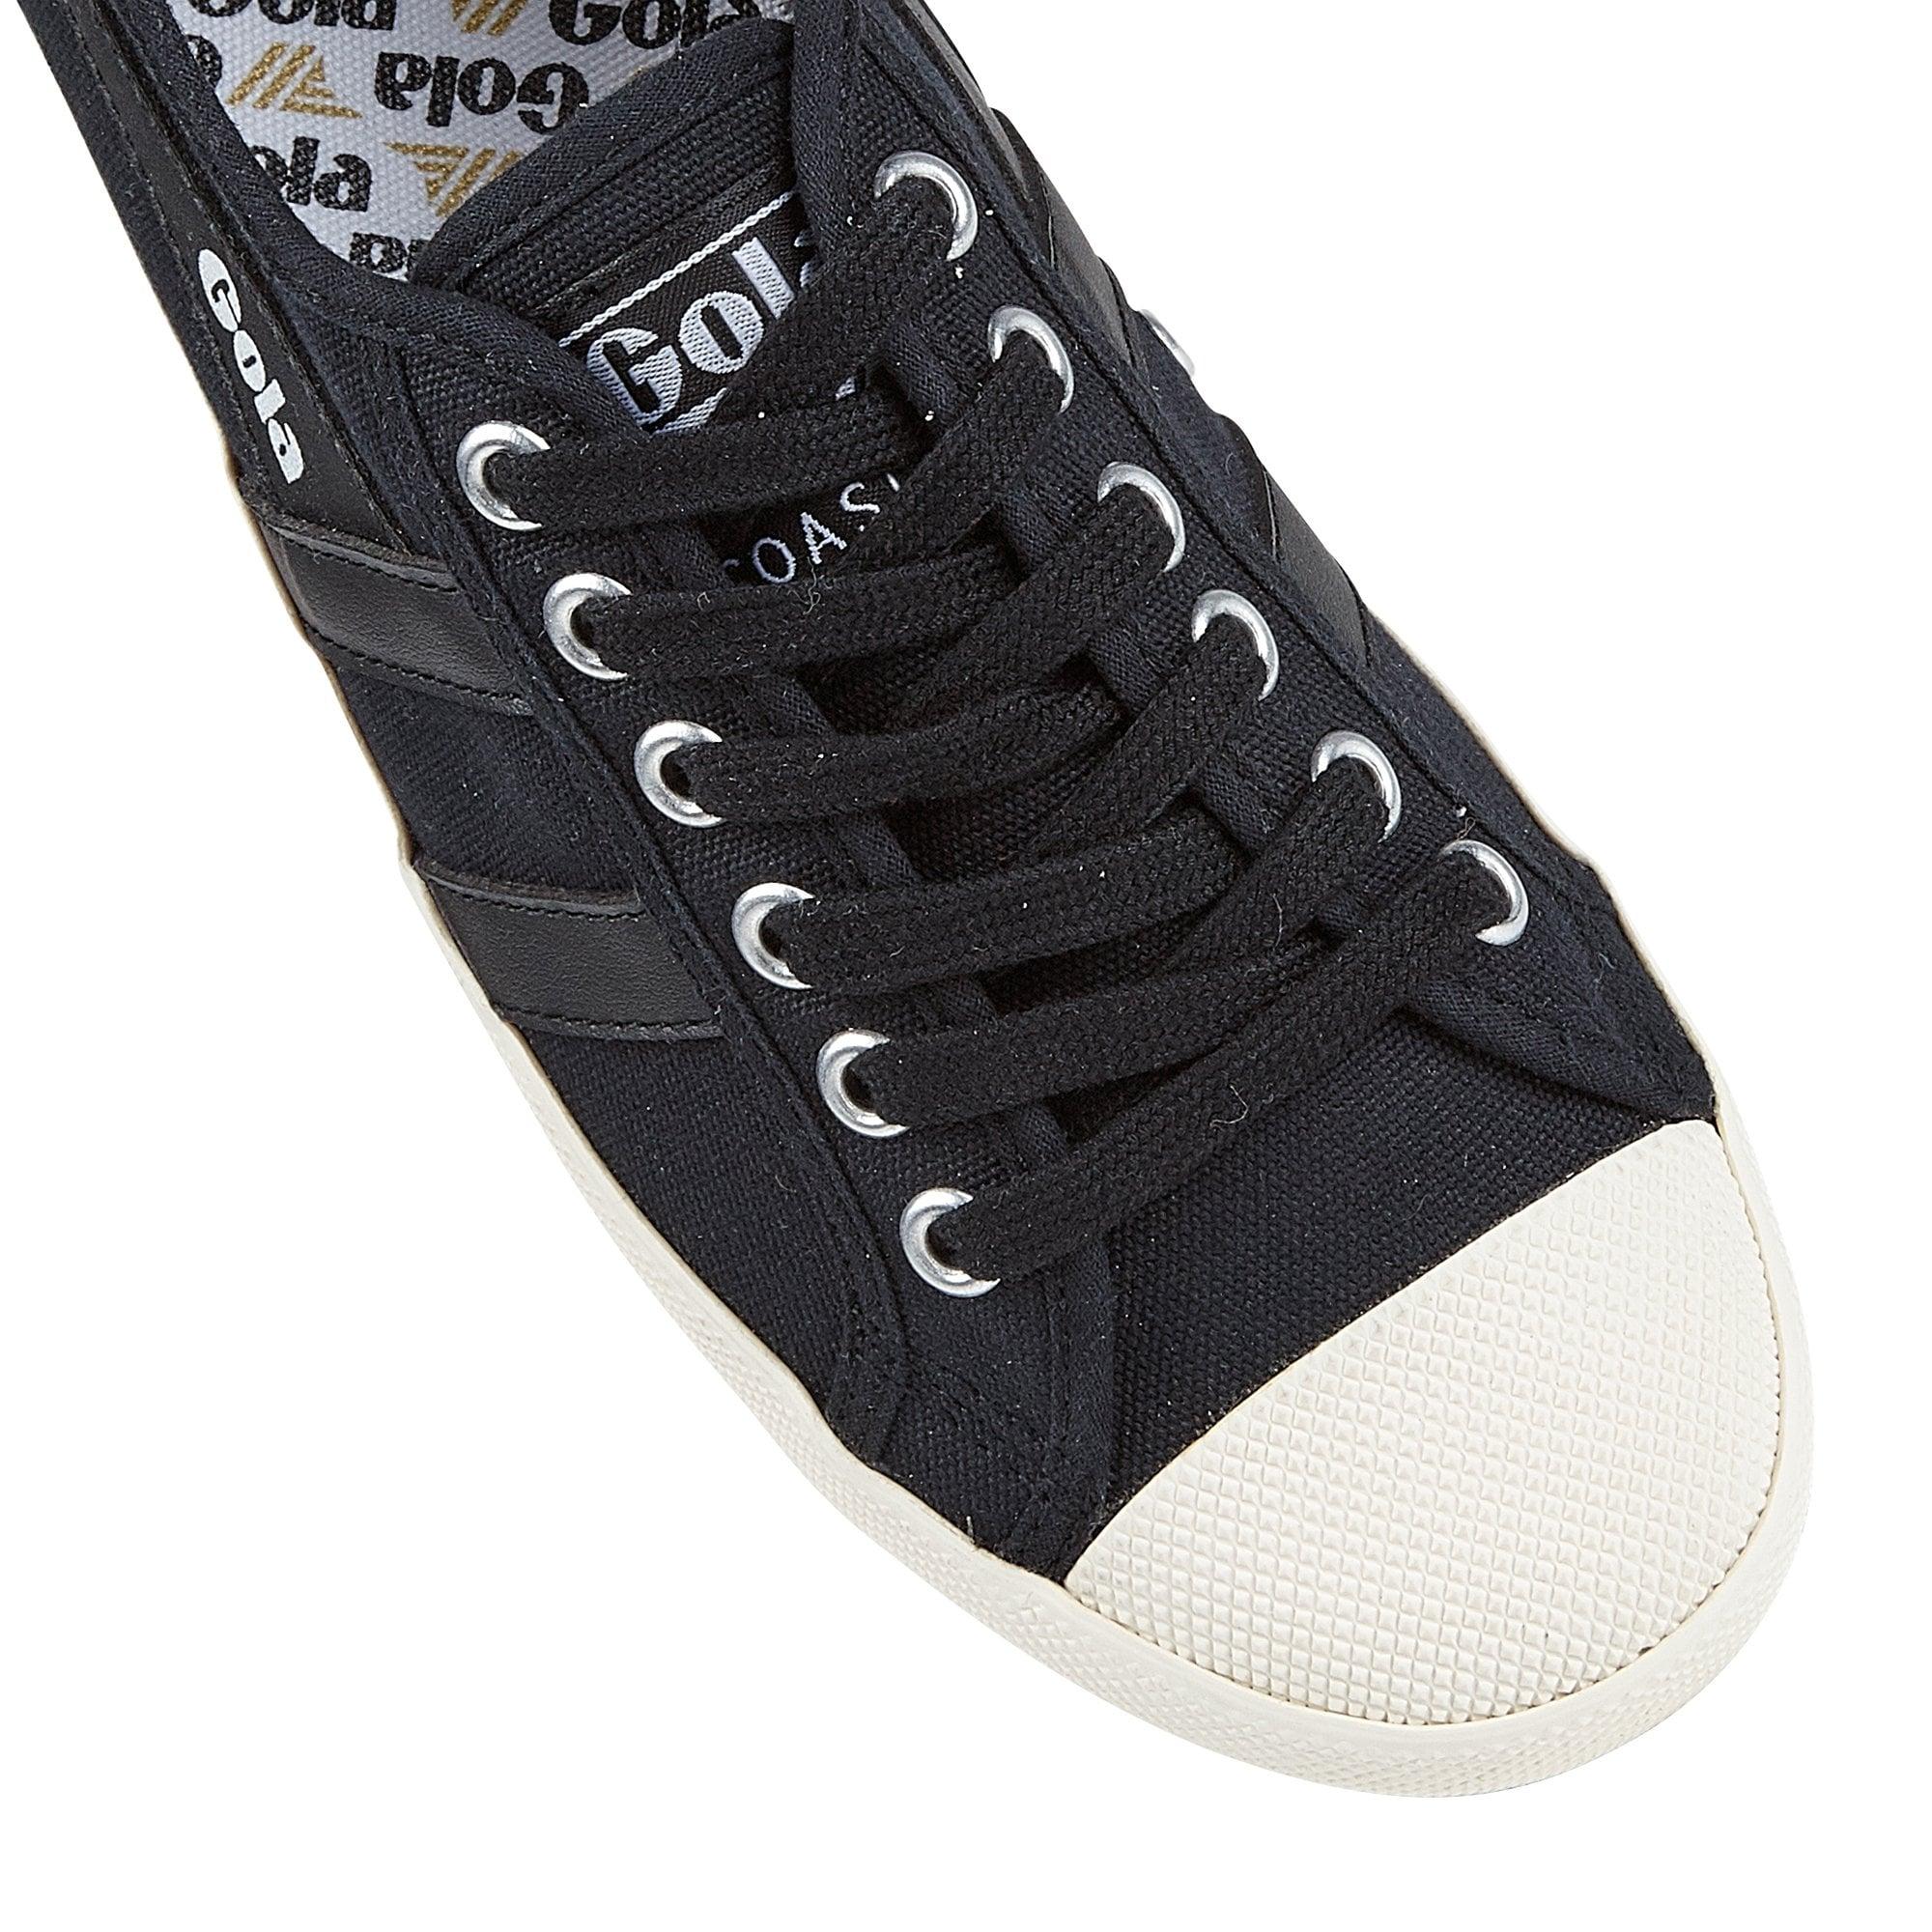 Buy Gola womens Sidwalk boots online